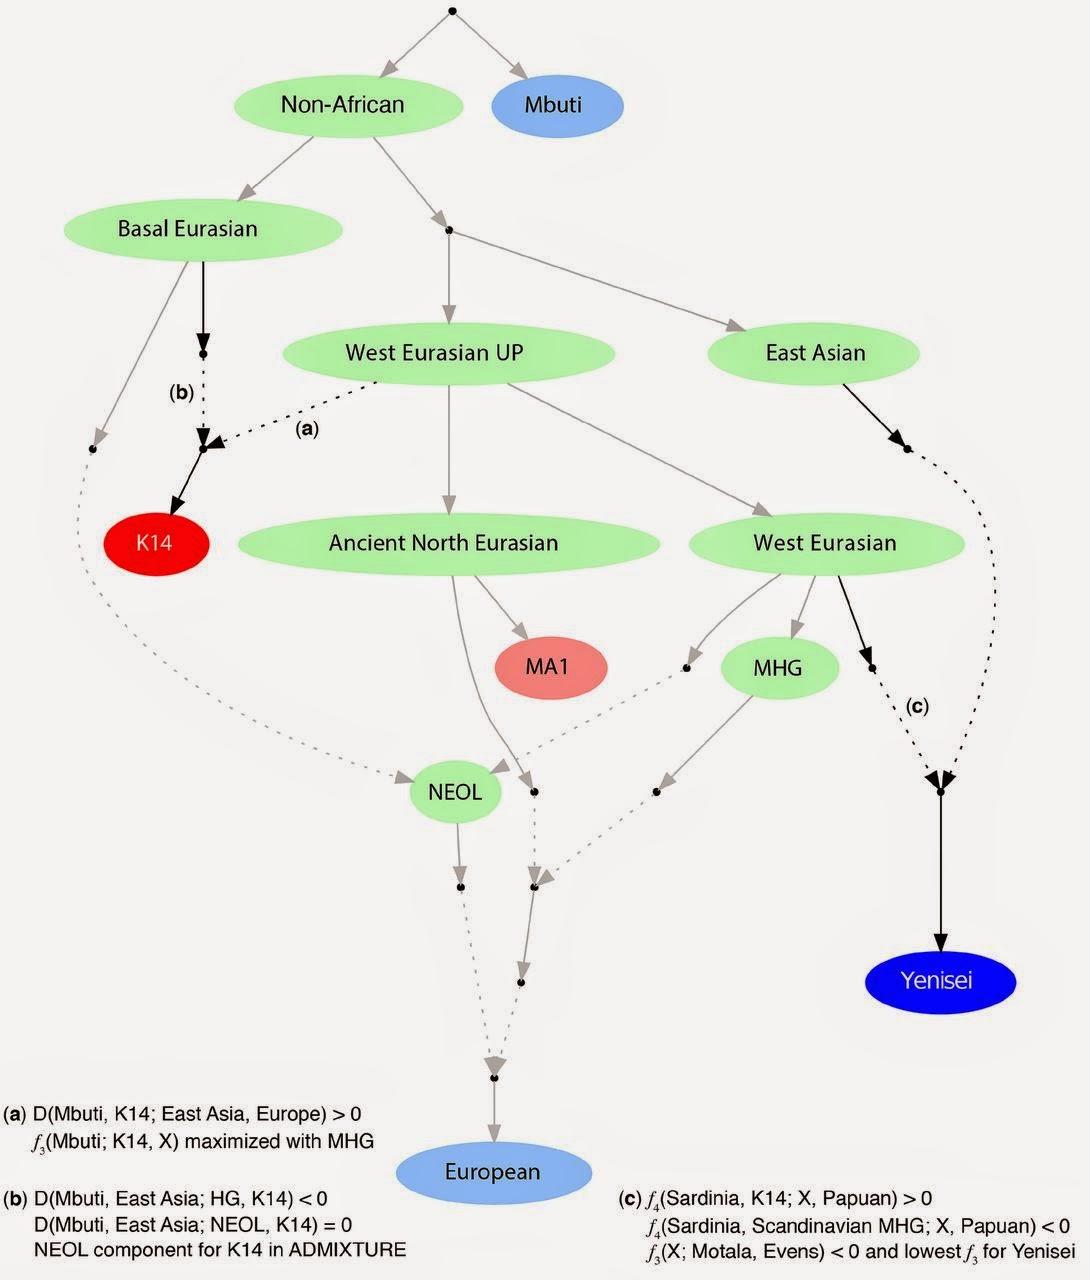 Dienekes anthropology blog genome of kostenki 14 an upper dienekes anthropology blog genome of kostenki 14 an upper paleolithic european seguin orlando korneliussen sikora et al 2014 ccuart Choice Image